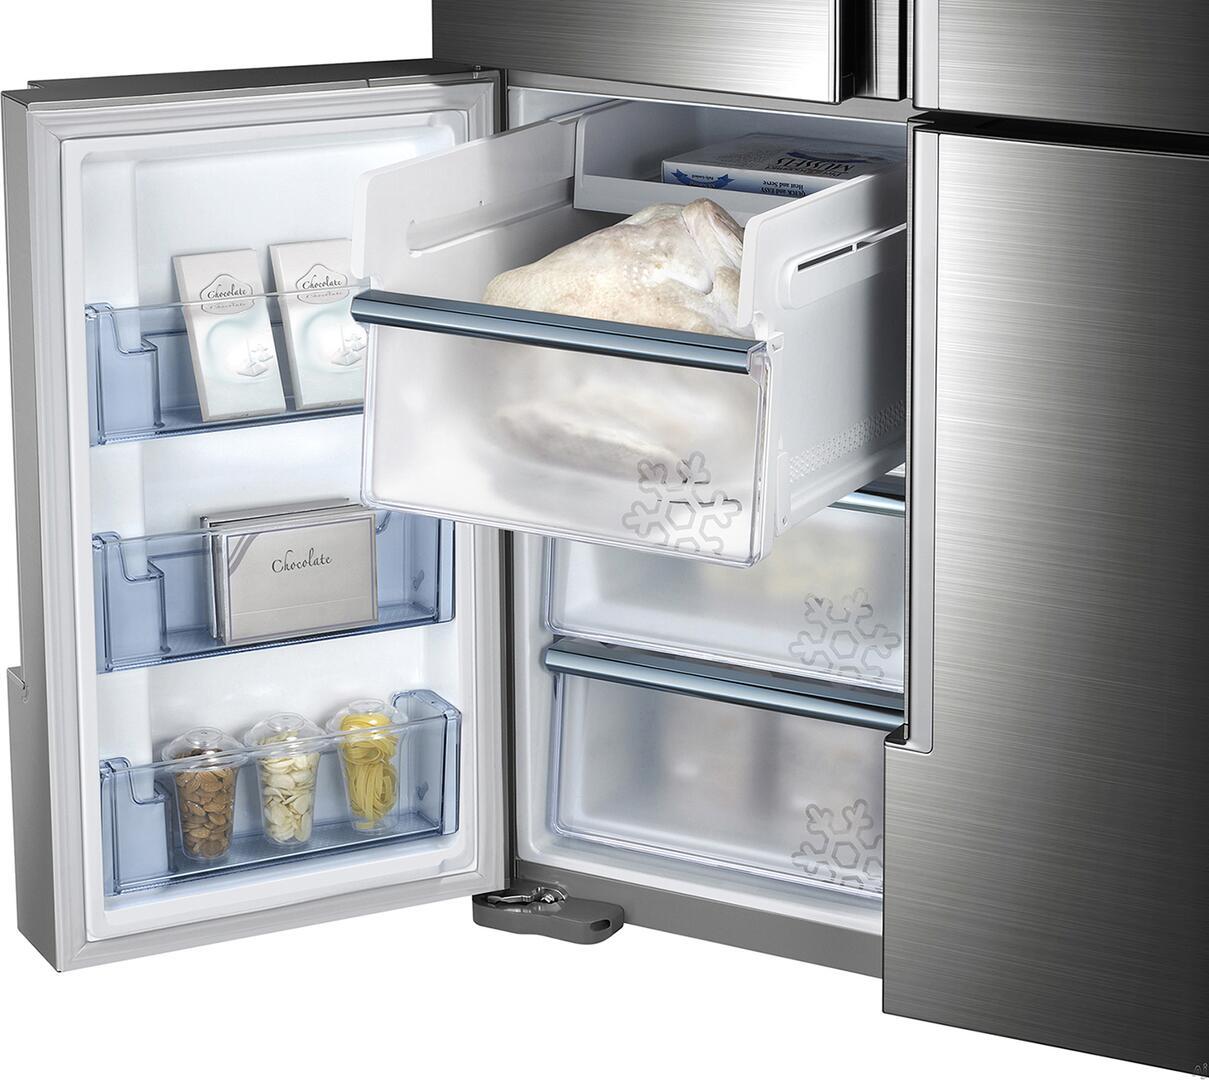 Samsung Appliance Rf34h9950s4 36 Inch Chef Series 4 Door